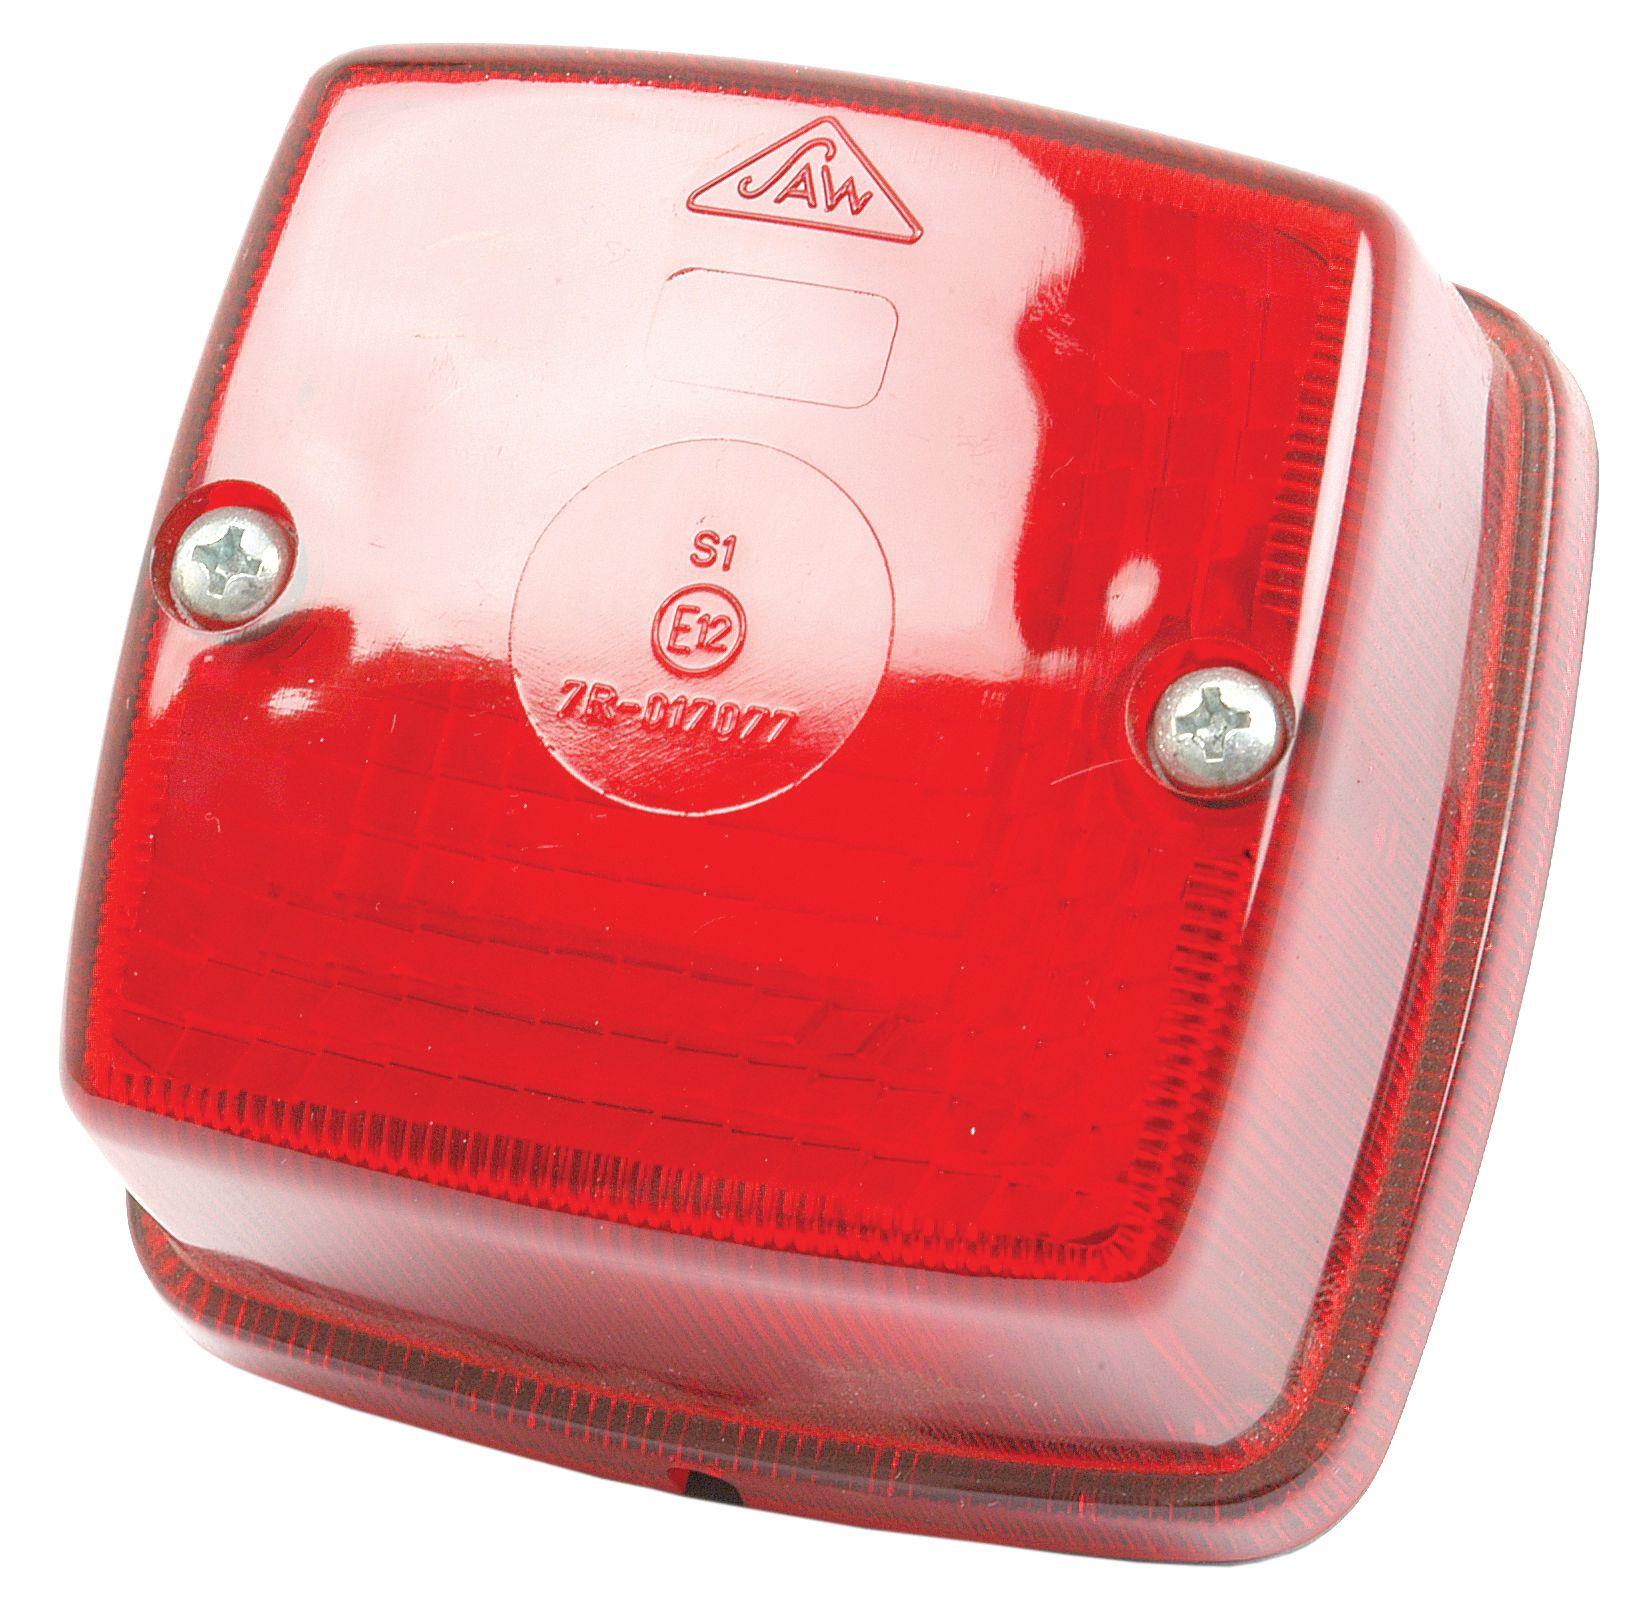 CASE IH REAR/MOUNT LAMP SINGLE FUNC 56035